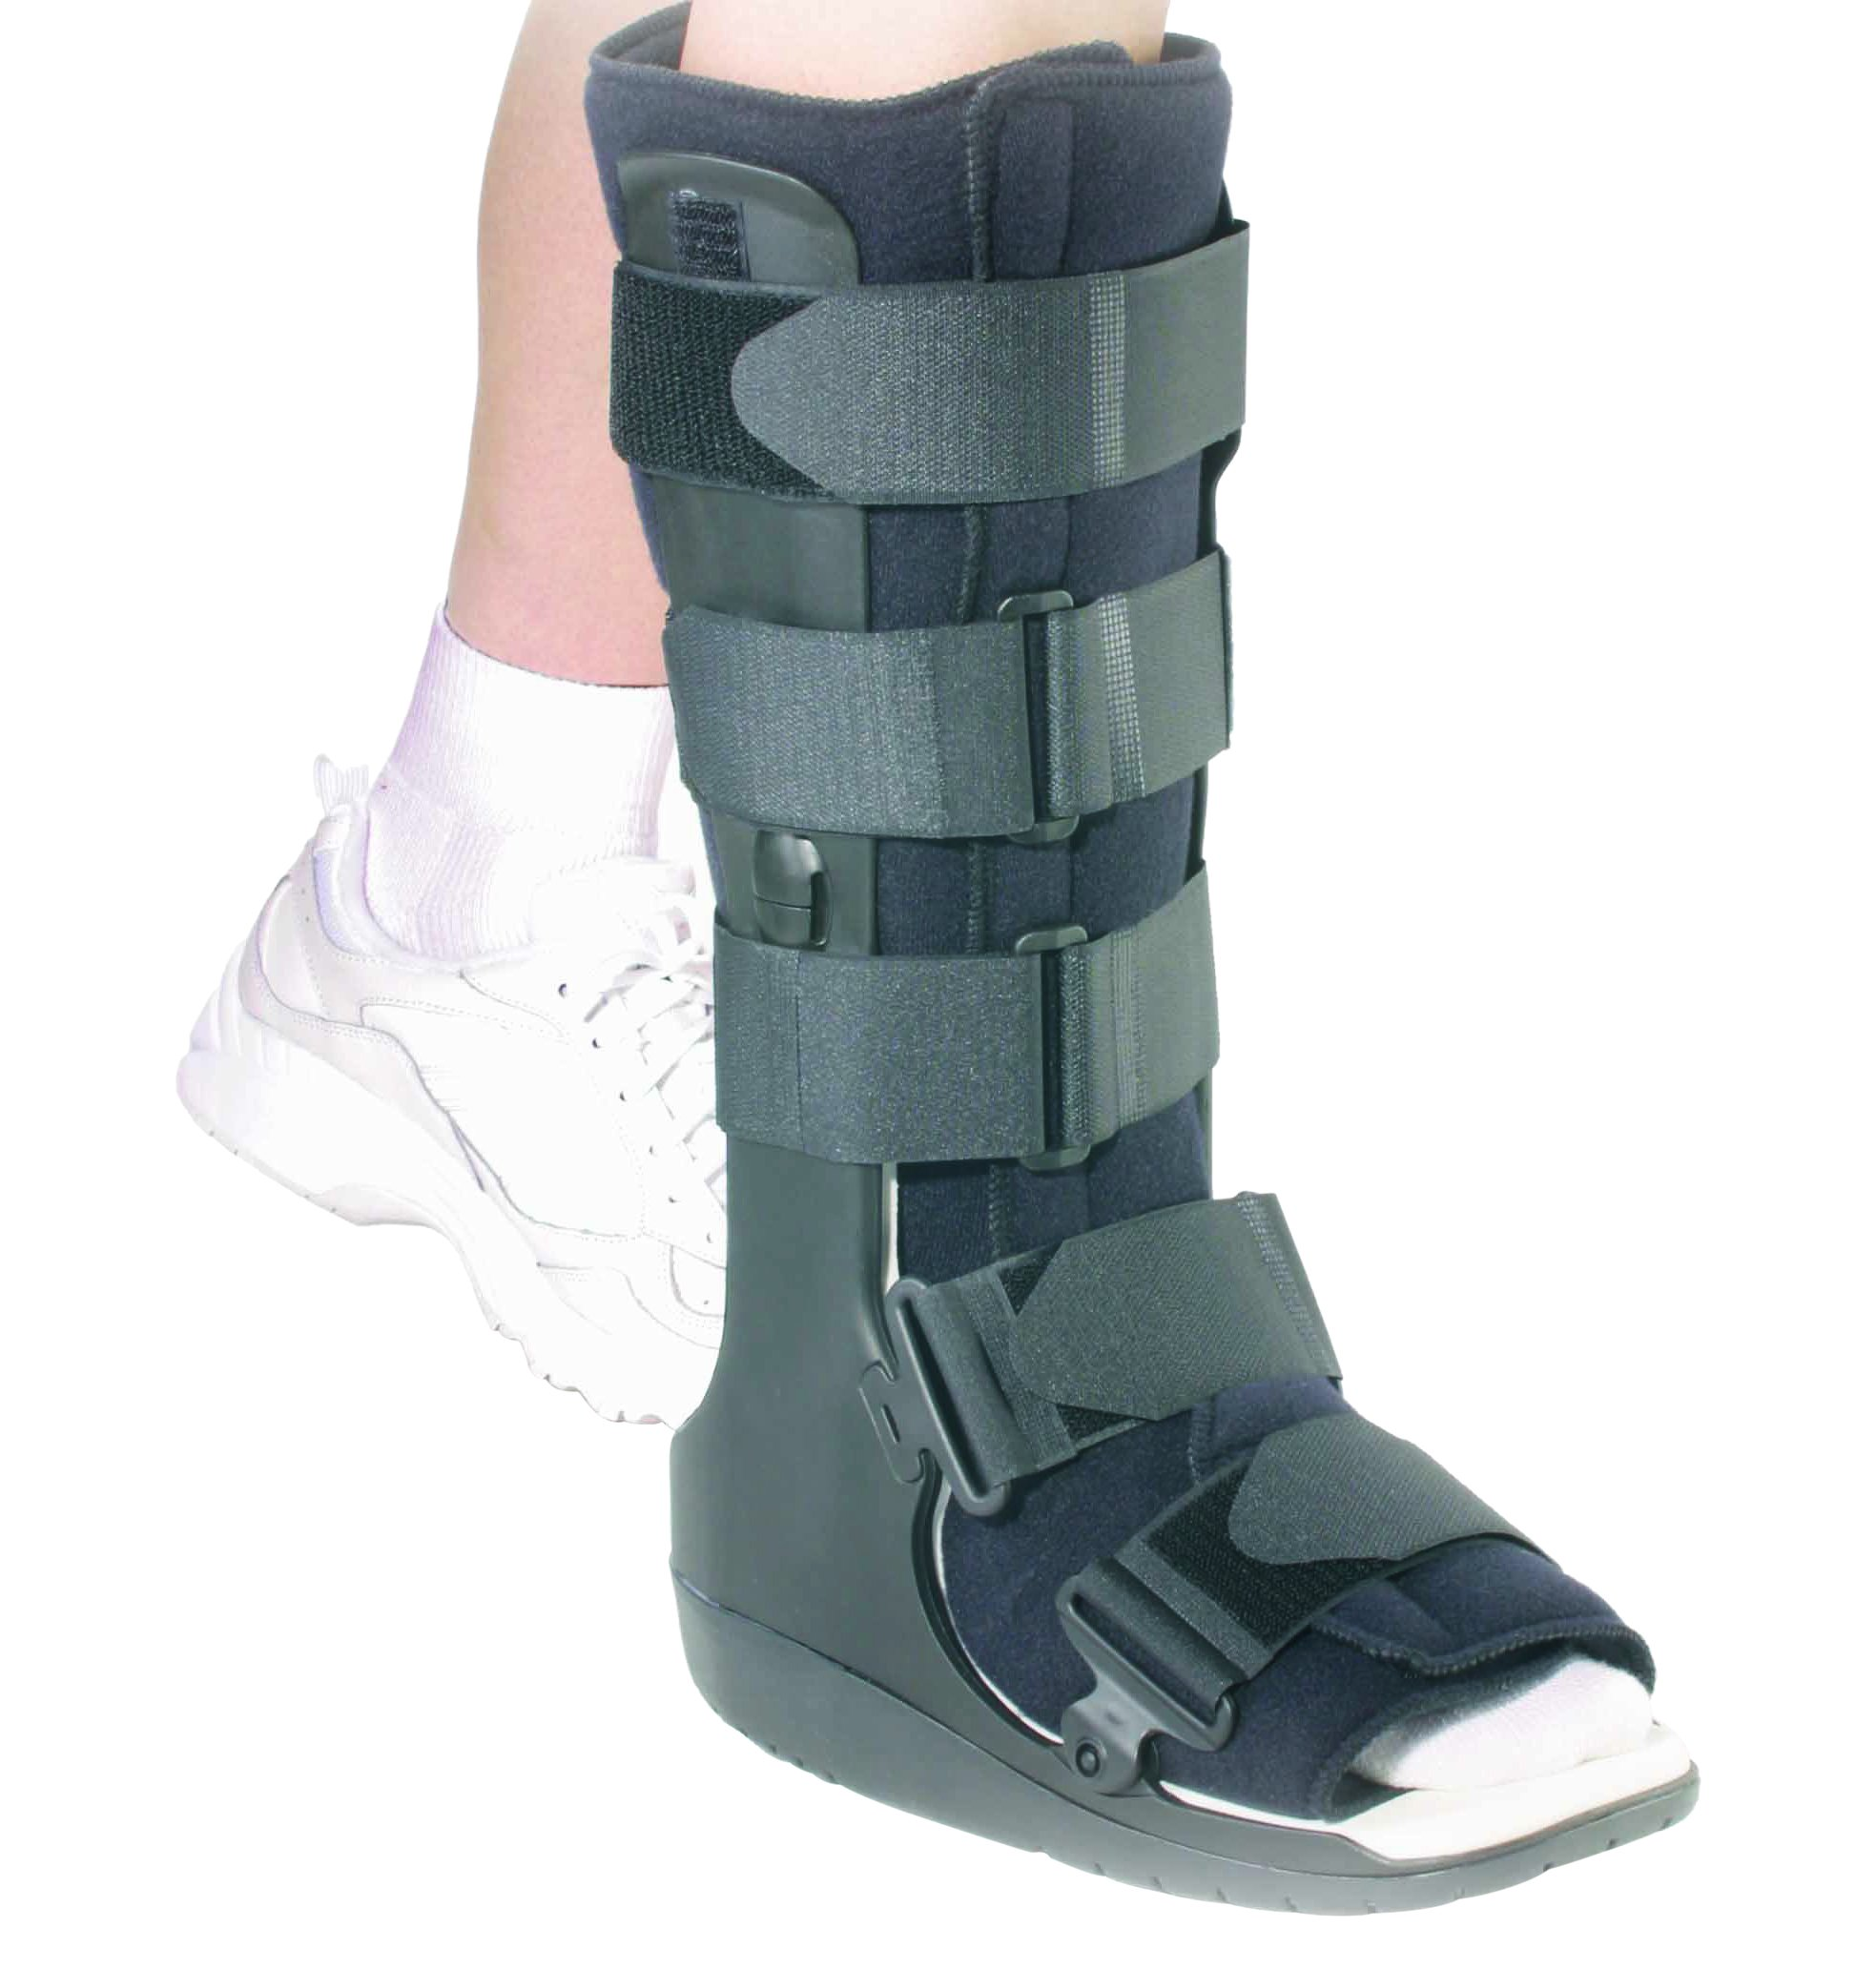 OTC High Top Leg Cast Walker Boot, Black, Medium/Delux Tall by OTC